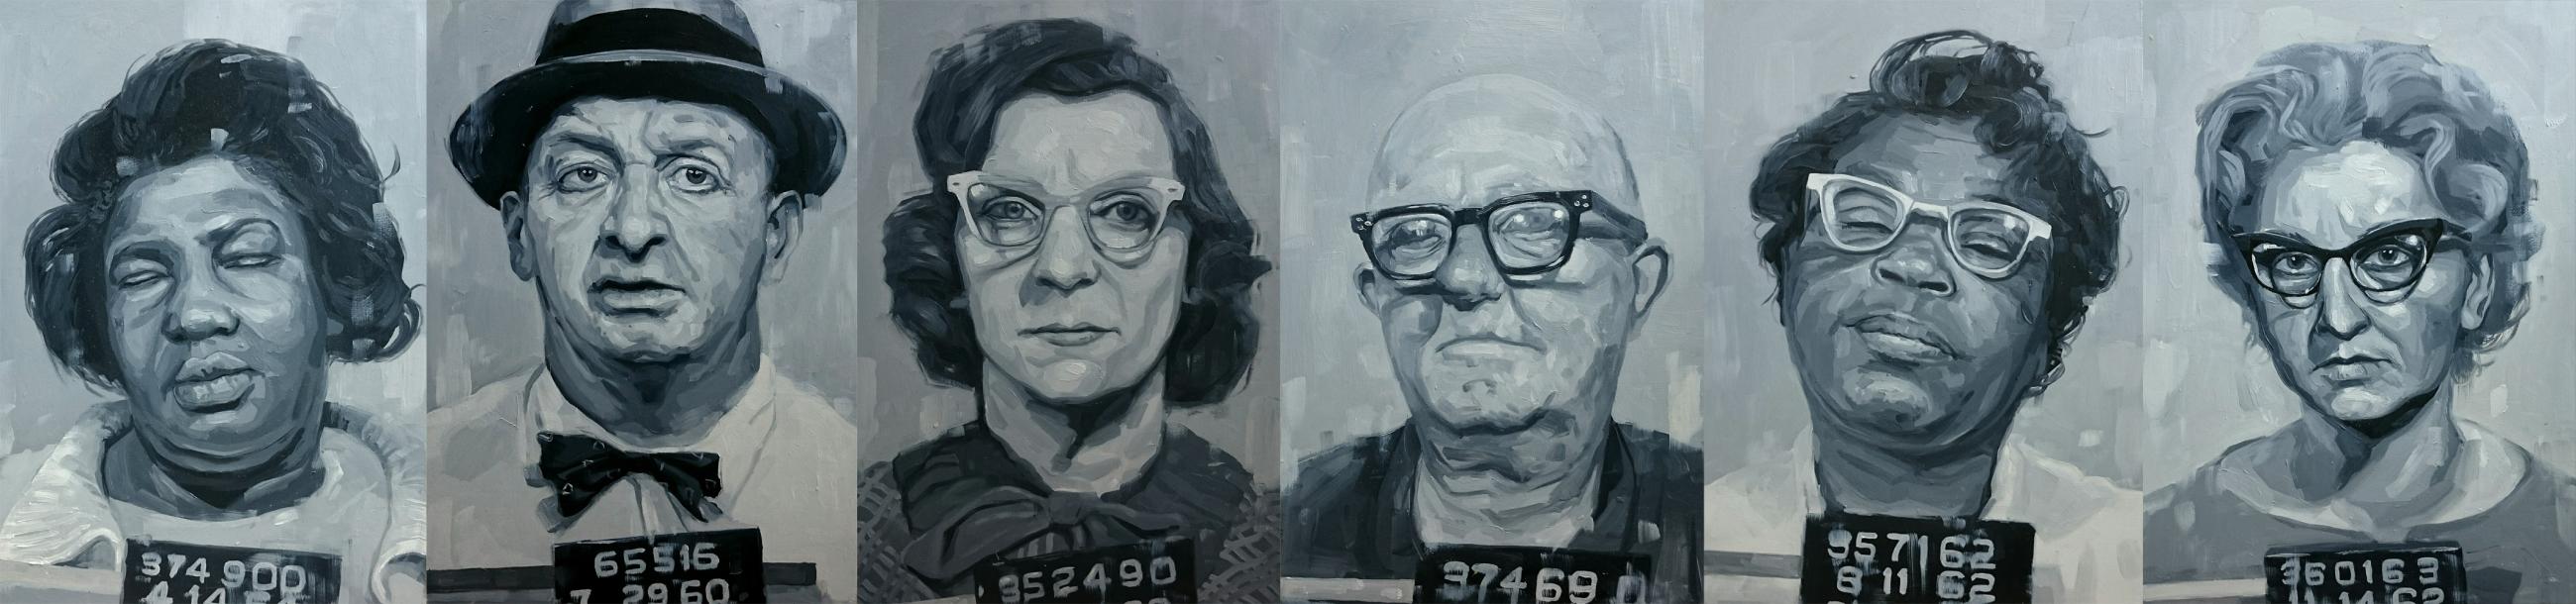 Oliver Winconek portrait artist